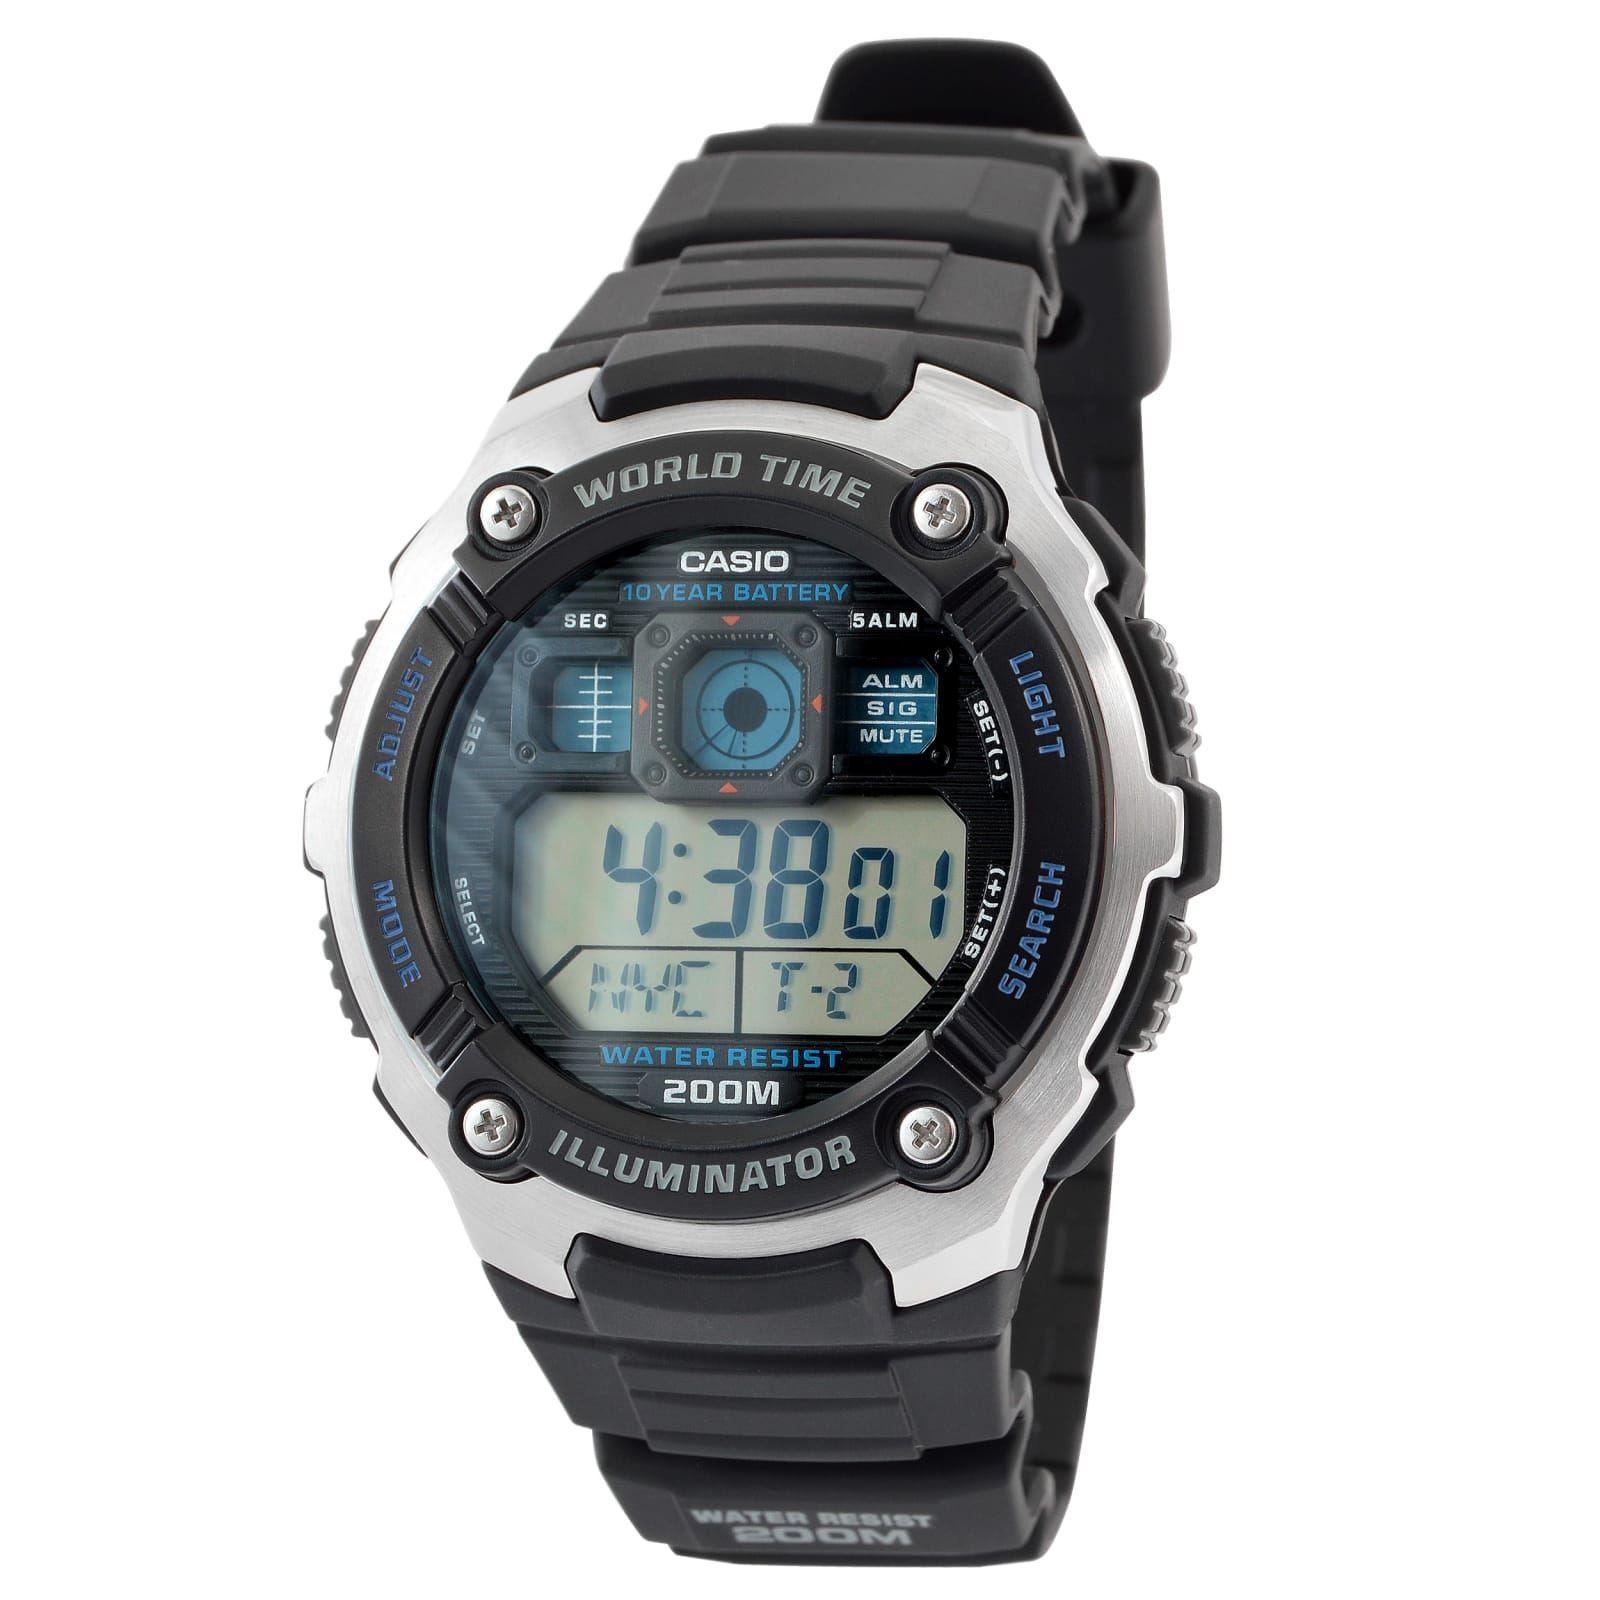 Illuminator Sport Watch | Casio | Free shipping over $75 #sportswatches